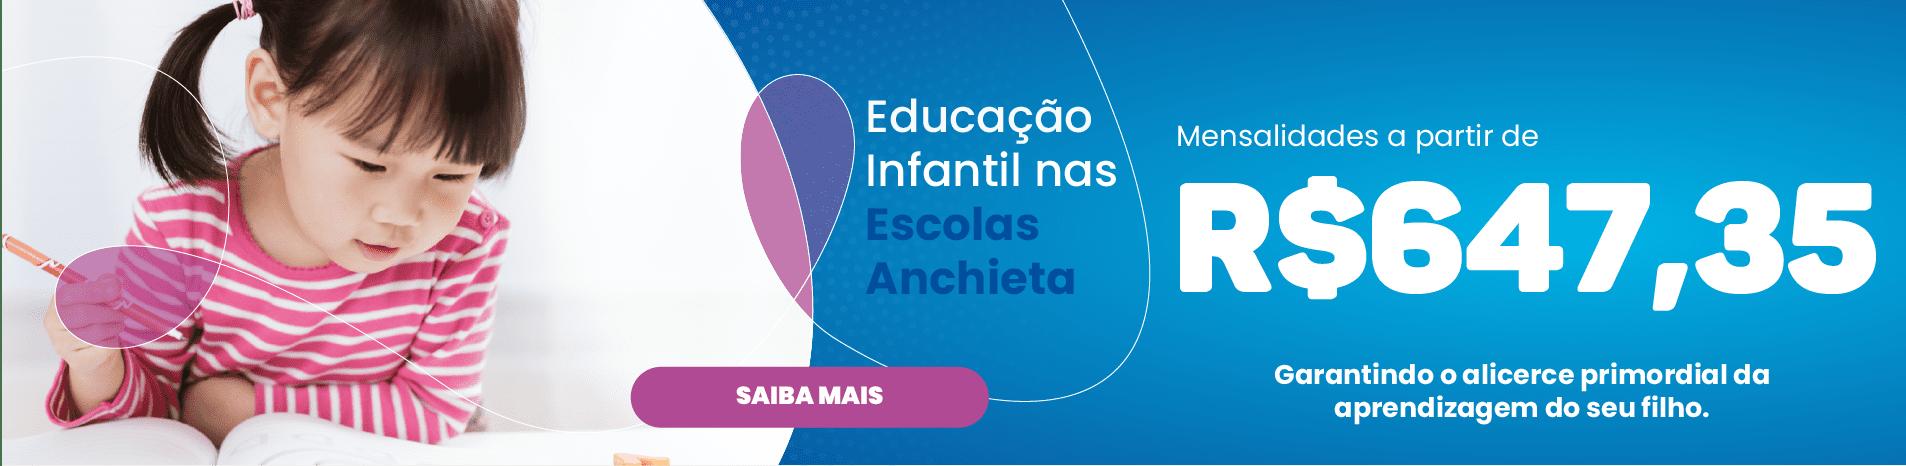 banner-escolas-educacao-infantil-valor-alterado